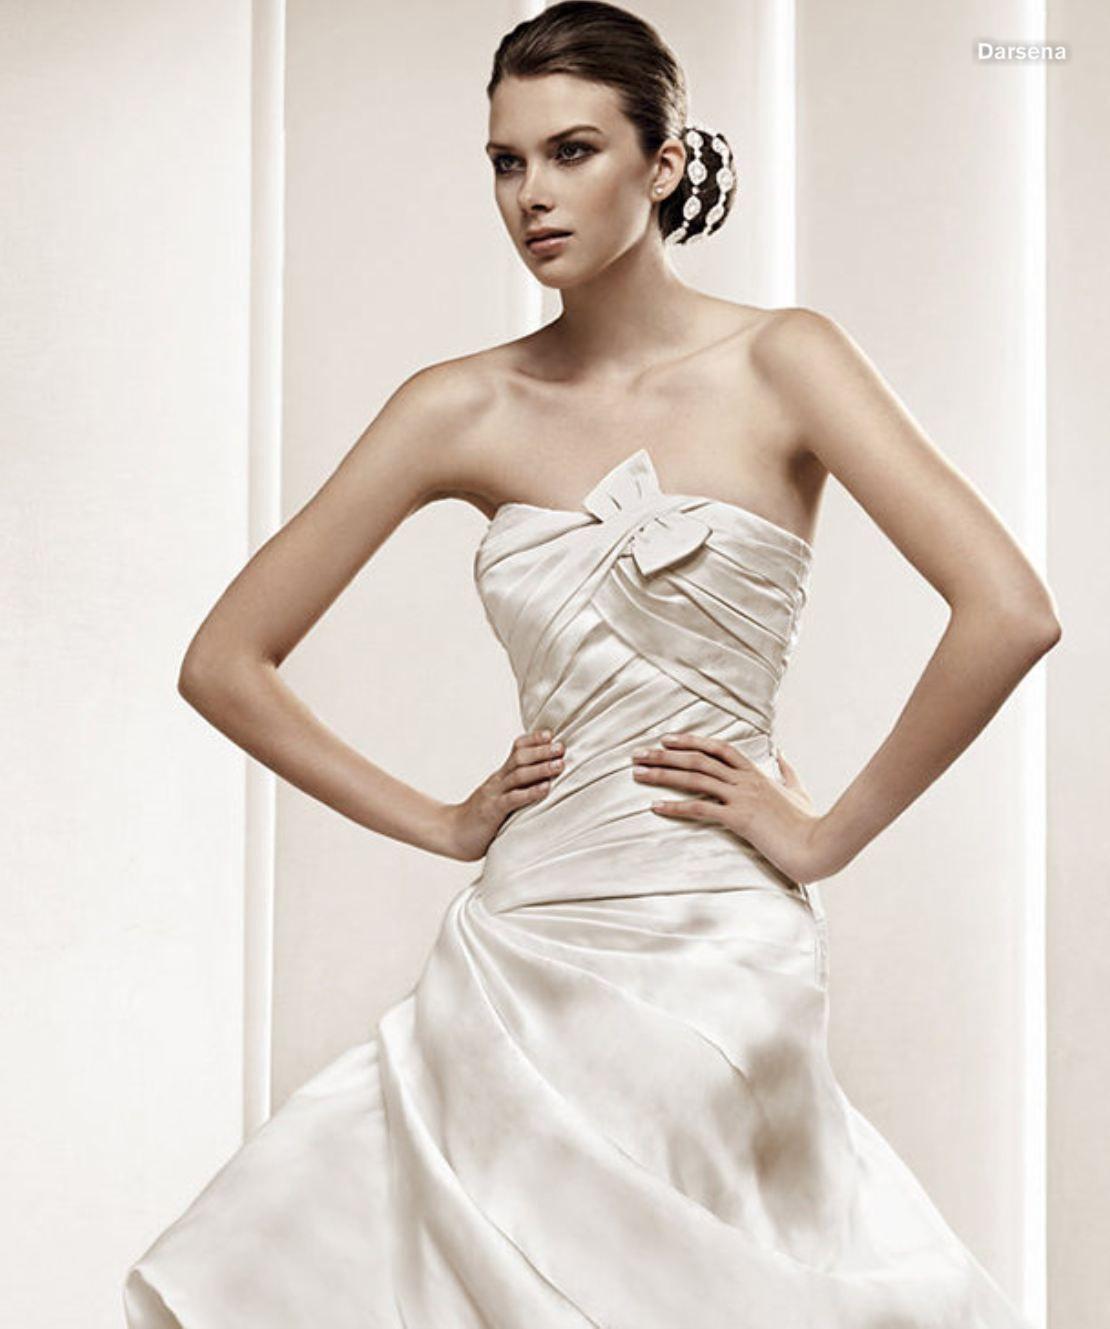 La sposa bridal gown style darsena ball gown wedding